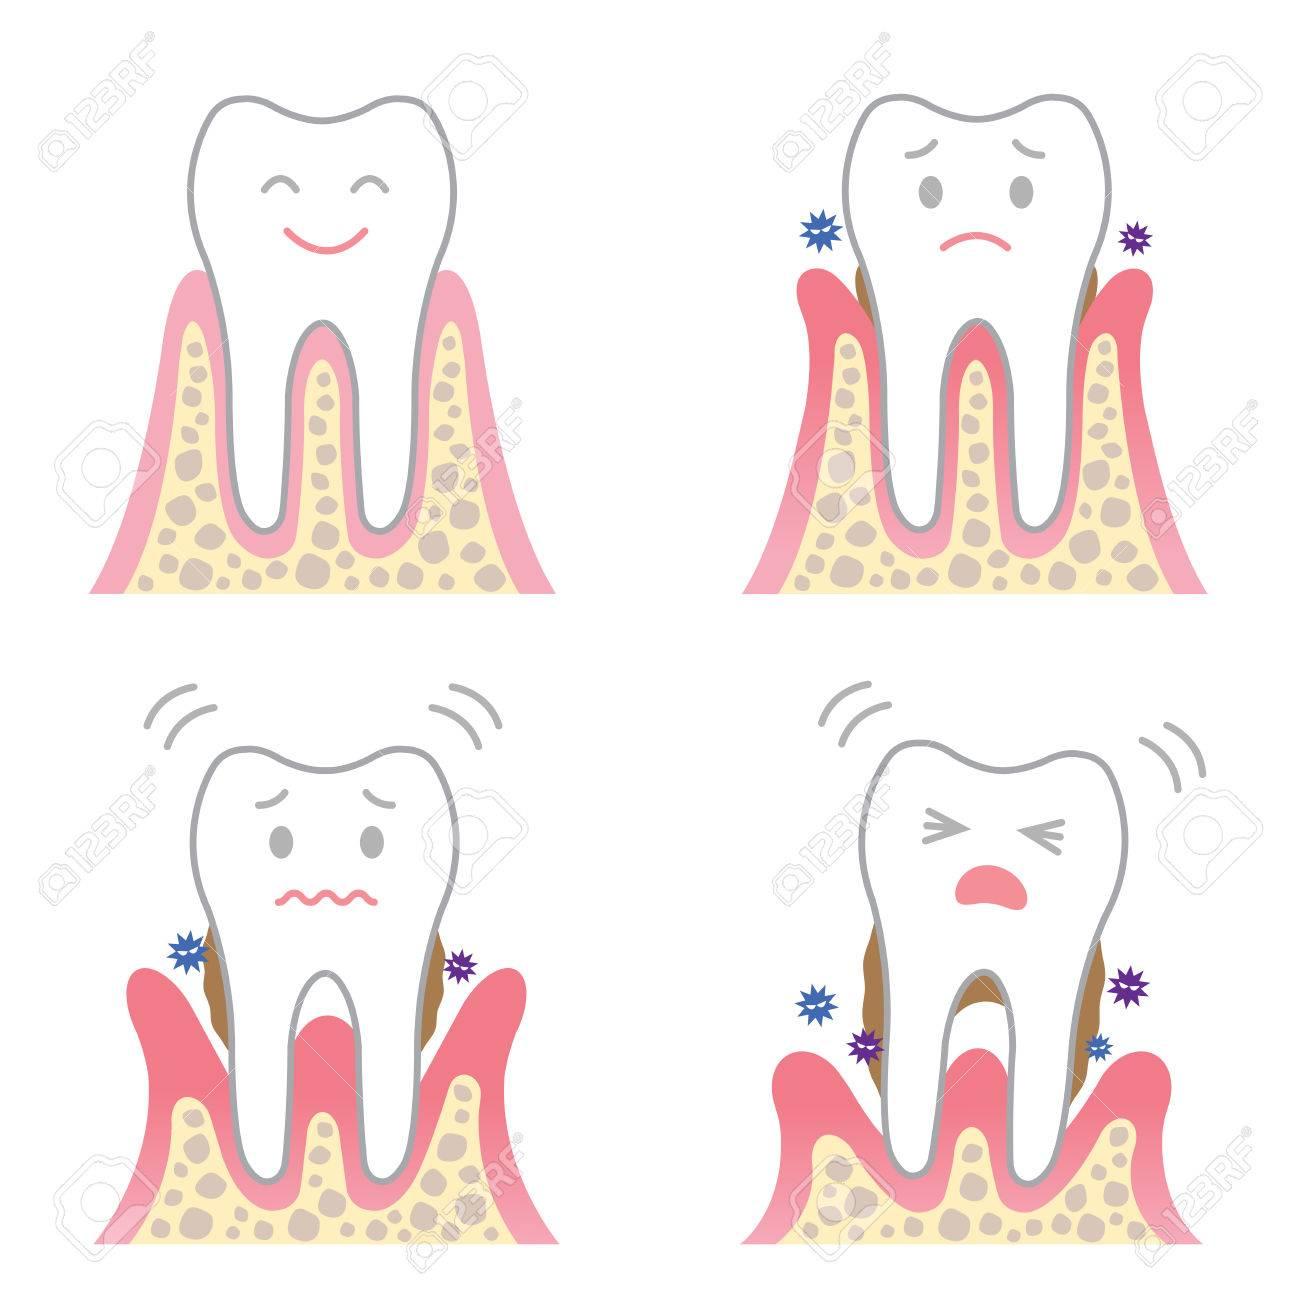 periodontal disease - 64624920